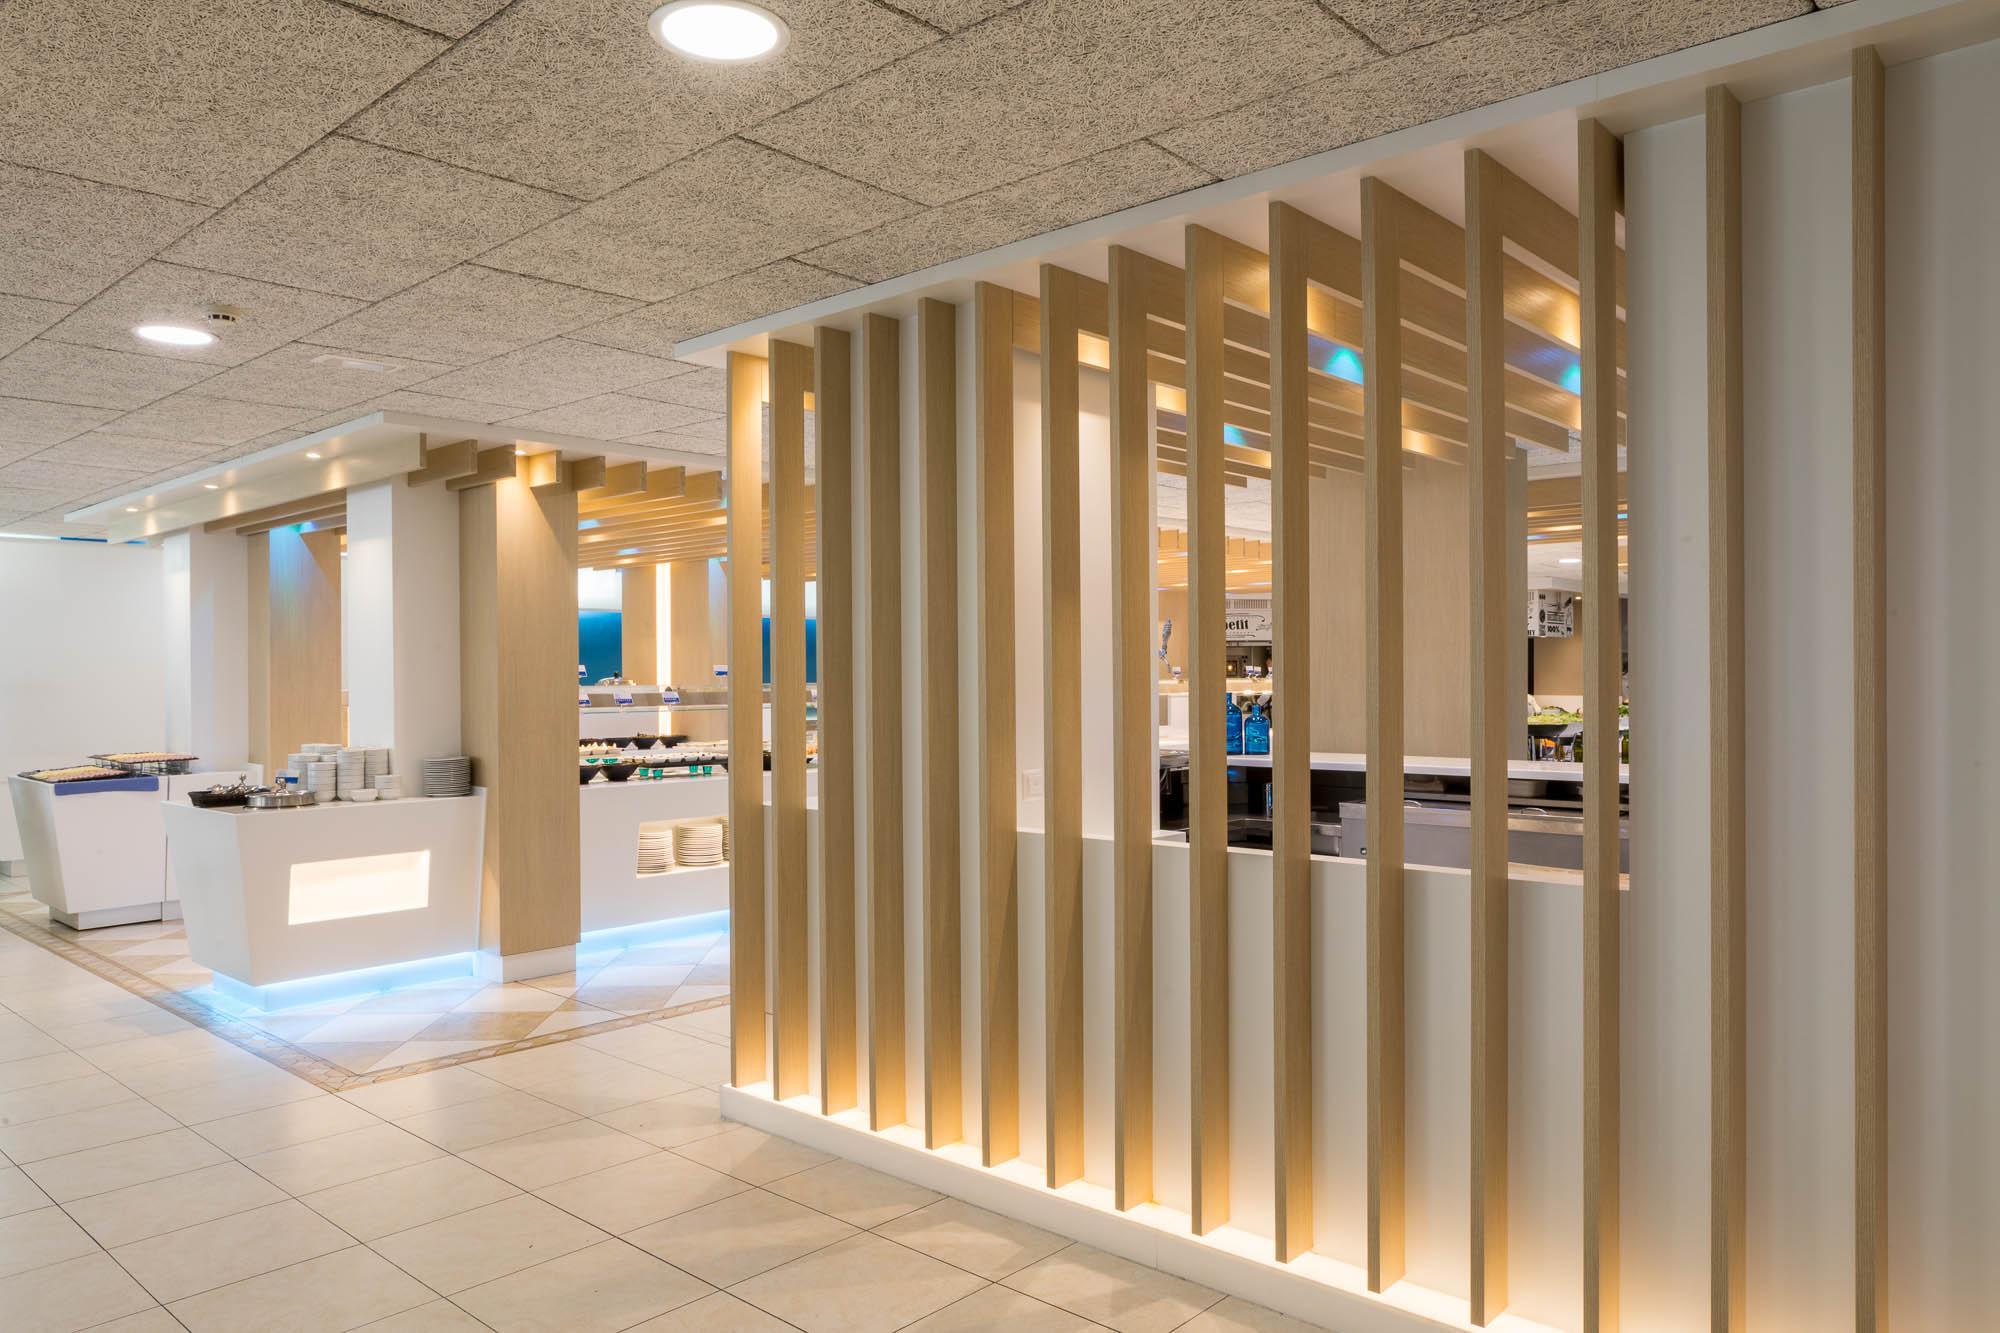 Buffet KREON Hotel Odissea Park por Rosa Colet Interior Design